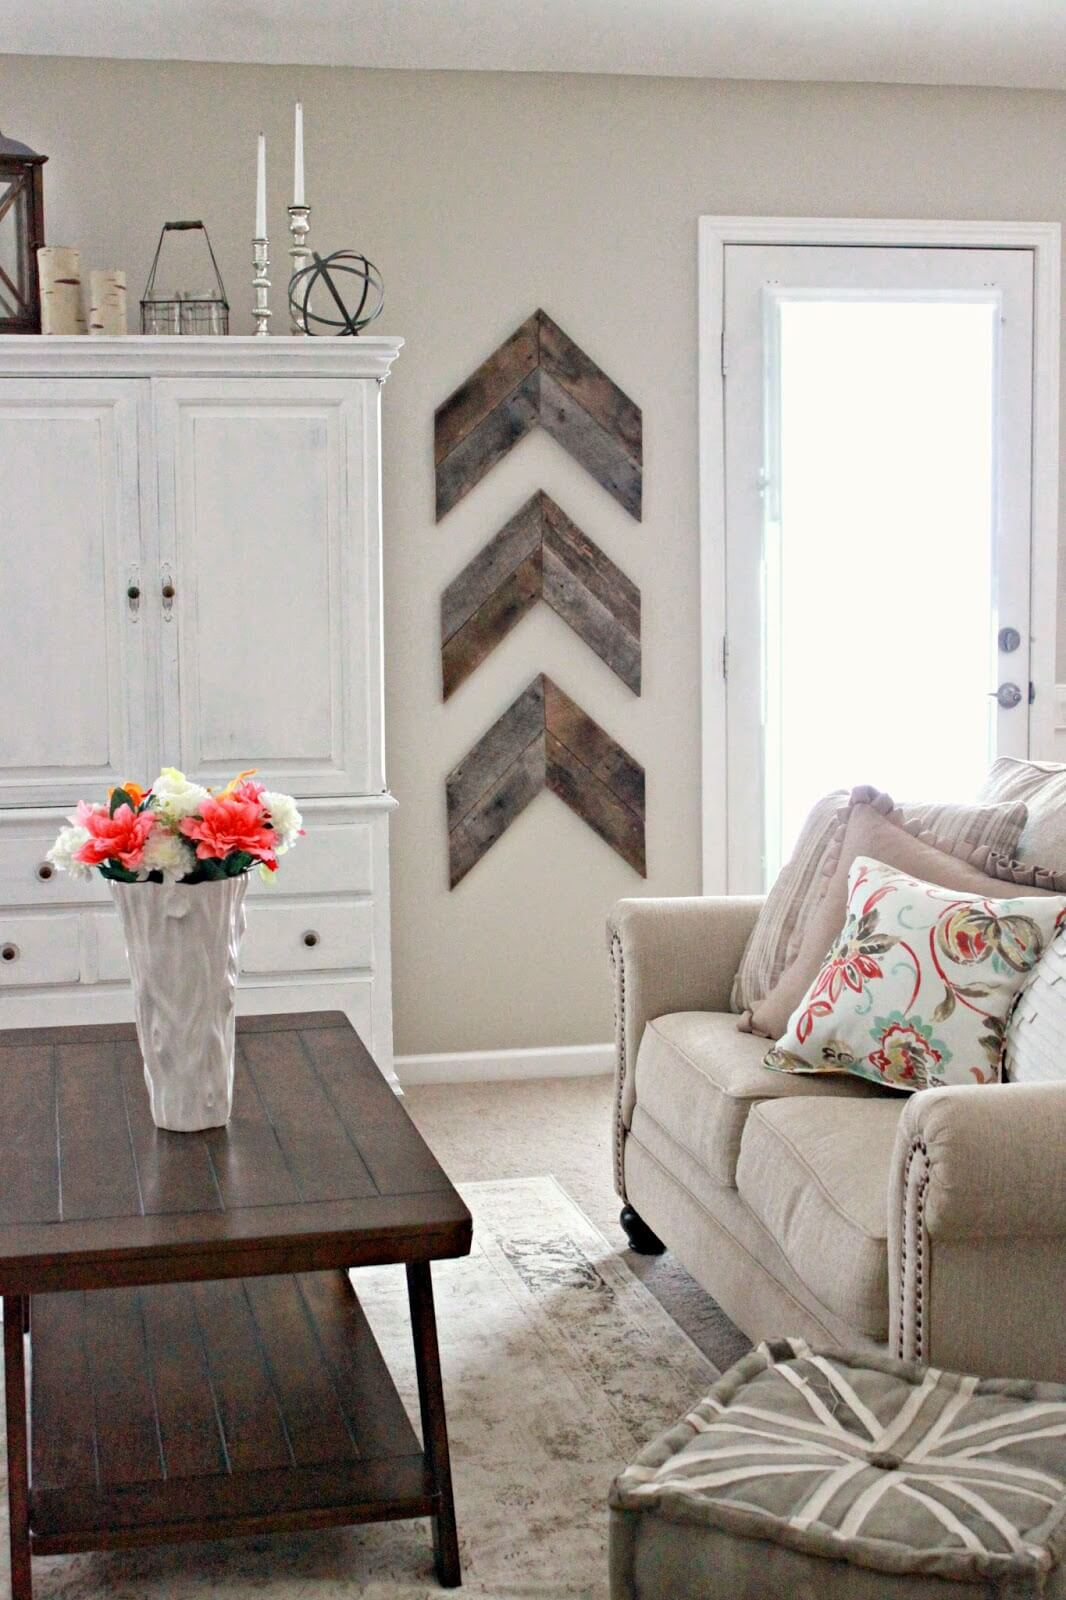 35 Best Farmhouse Living Room Decor Ideas and Designs for 2017 on Room Decor Ideas  id=54593